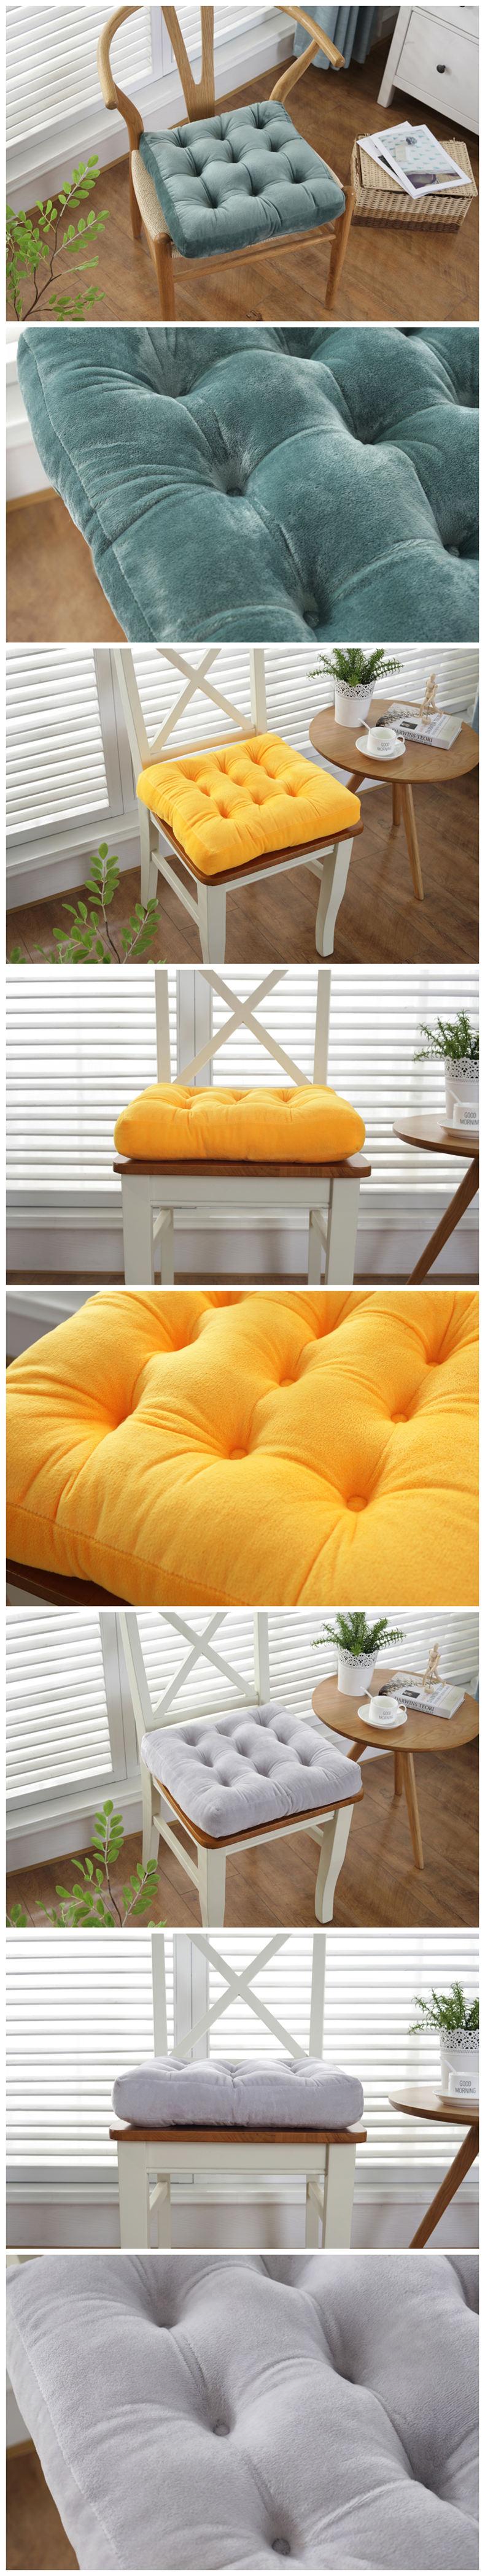 HTB1EvFRasfrK1Rjy1Xdq6yemFXan Thickening Anti-skid Cotton Chair Cushion Tatami Seat Pad Soft Office Chair Cushions Car Sit Mat Winter Cushion Throw Pillow